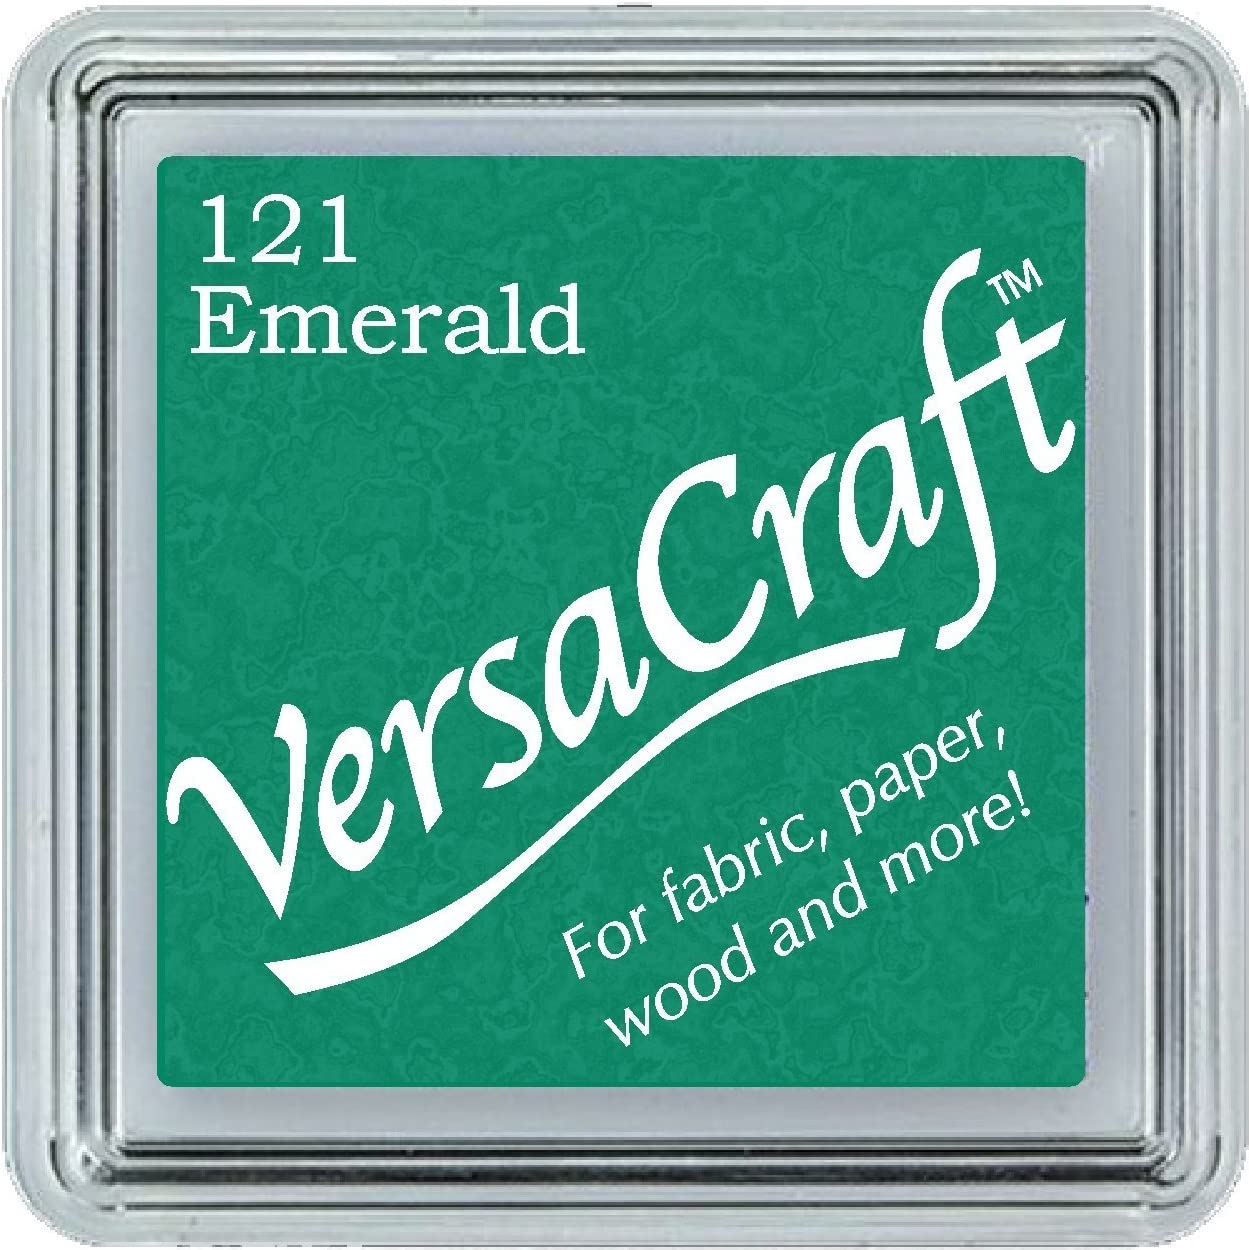 Emerald and Ultramarine Tsukineko All-Purpose Ink Duos for Fabric